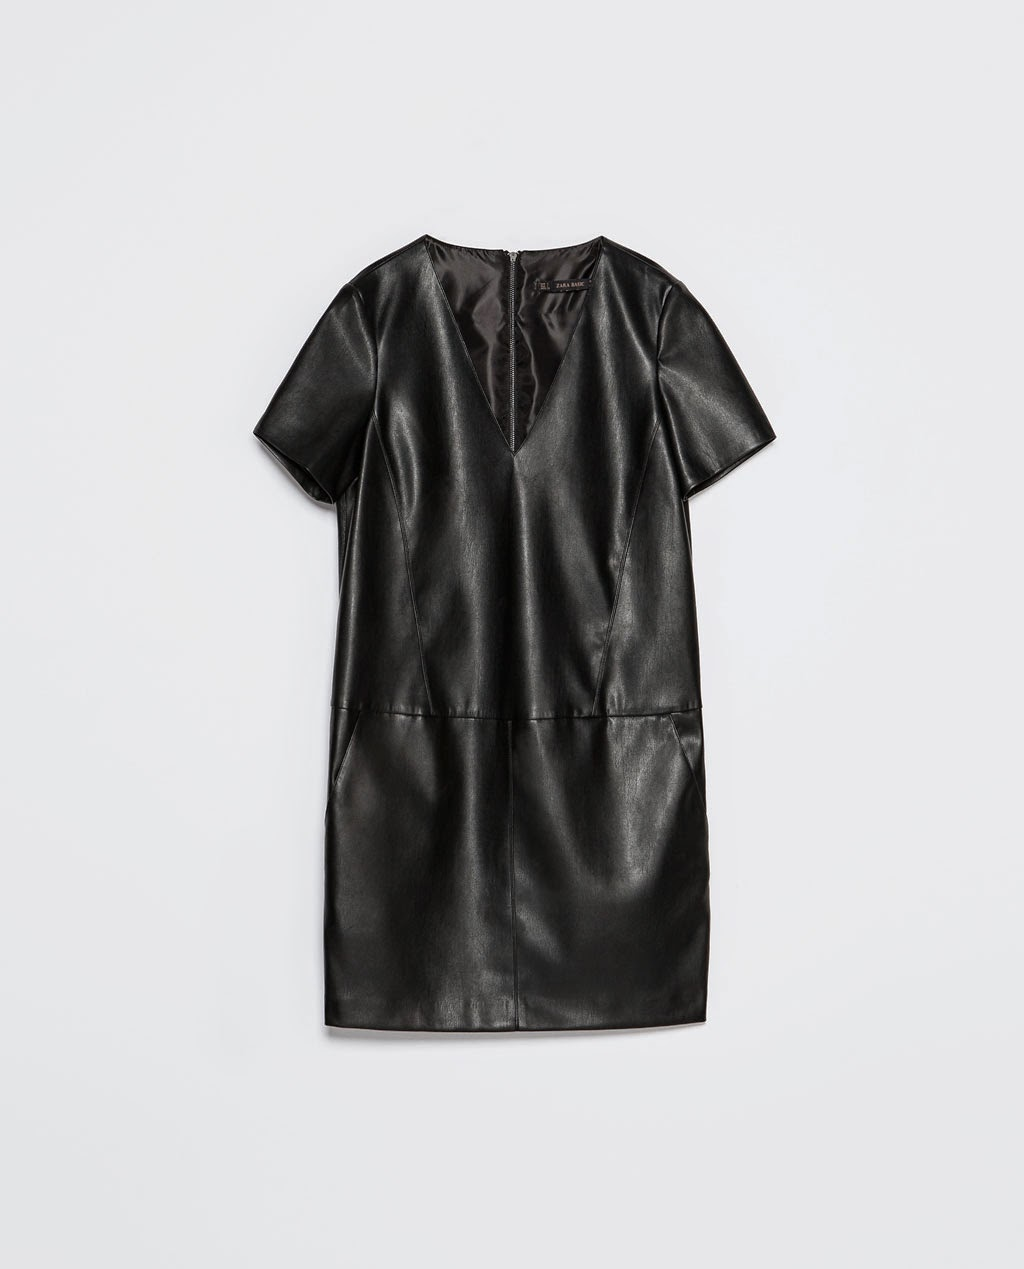 Zara, drees, vestido, black, polipiel, negro